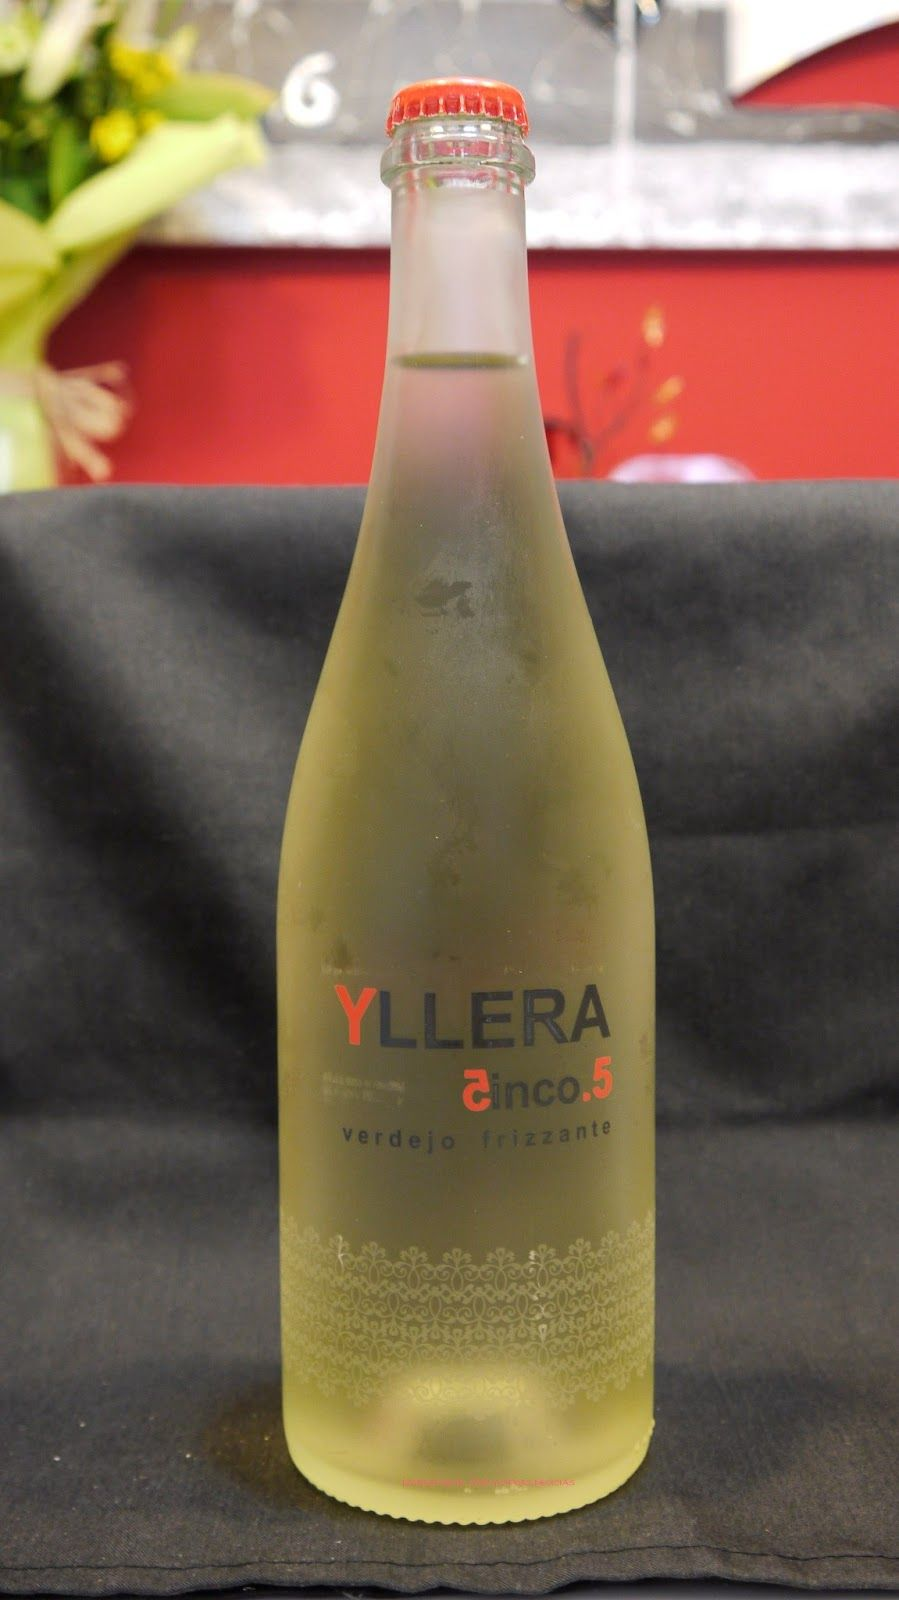 Yllera 5inco 5 Verdejo Frizzante Vinos Vino